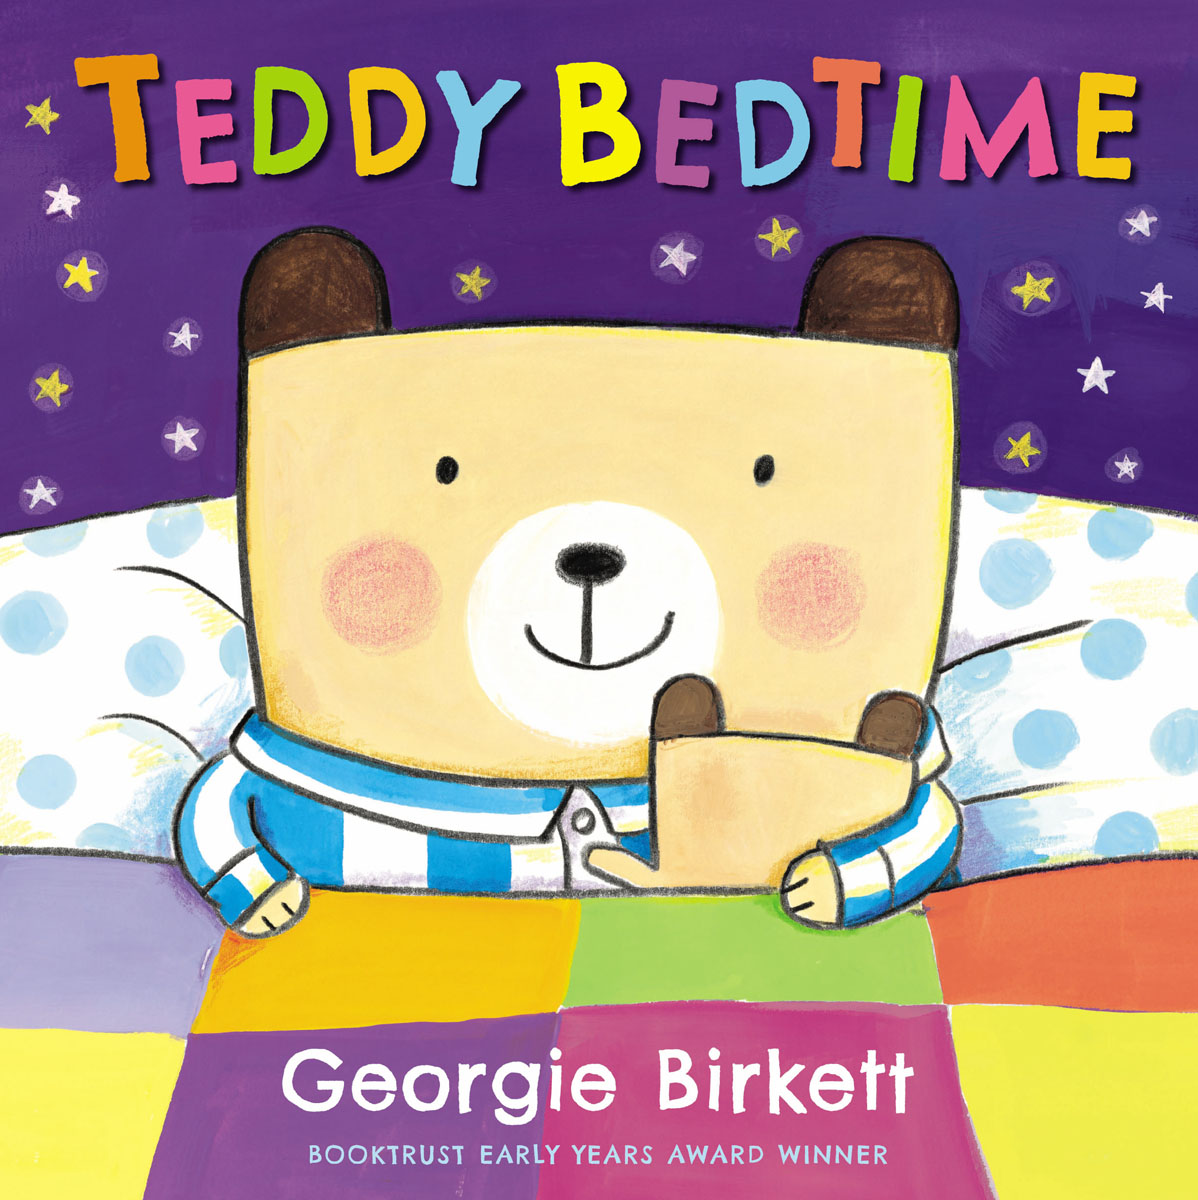 Teddy Bedtime teddy mars book 2 almost a winner